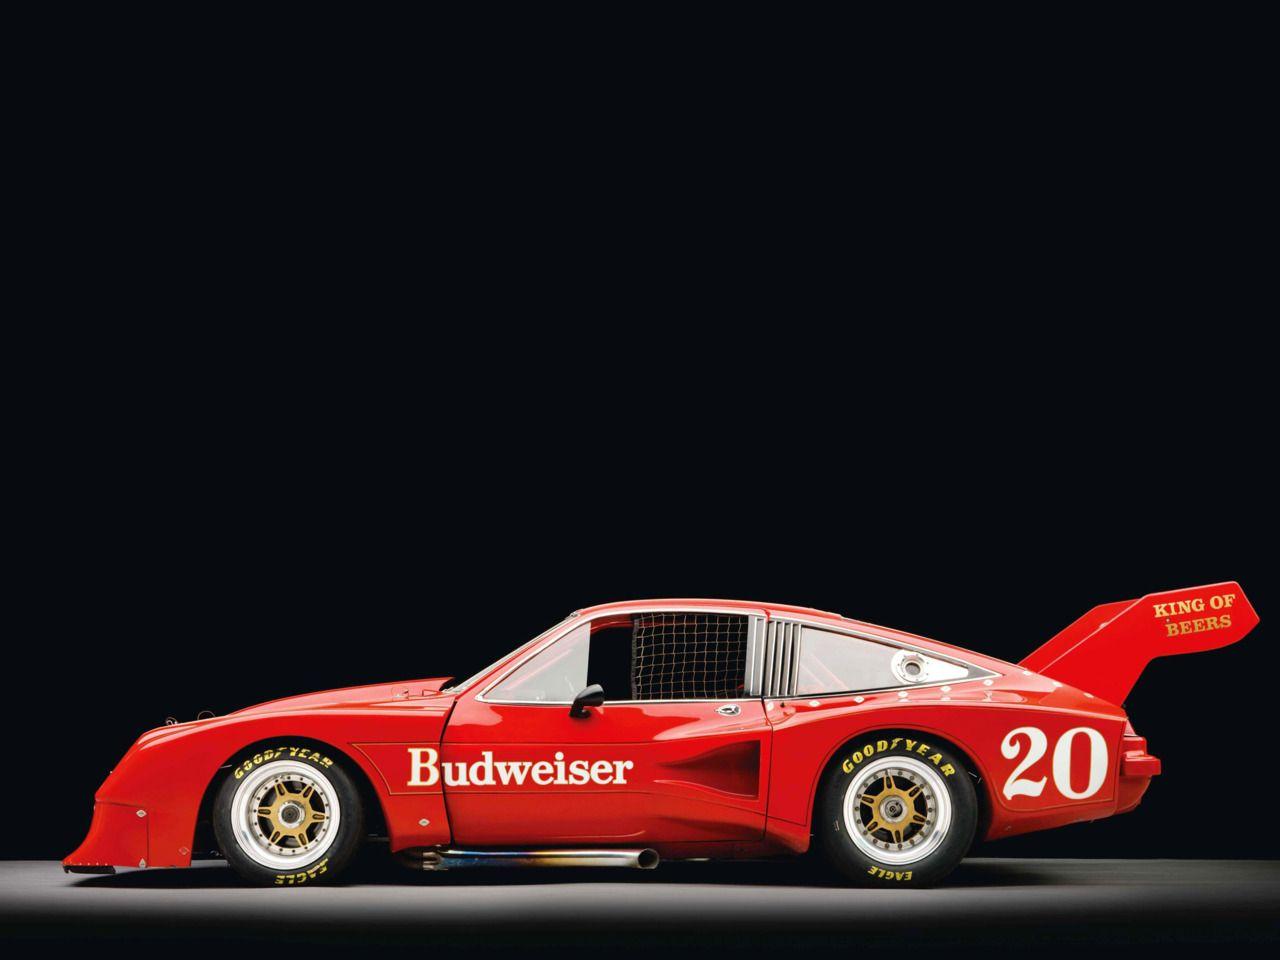 1975 Chevrolet Monza Dekon Imsa Gto Chevrolet Monza Classic